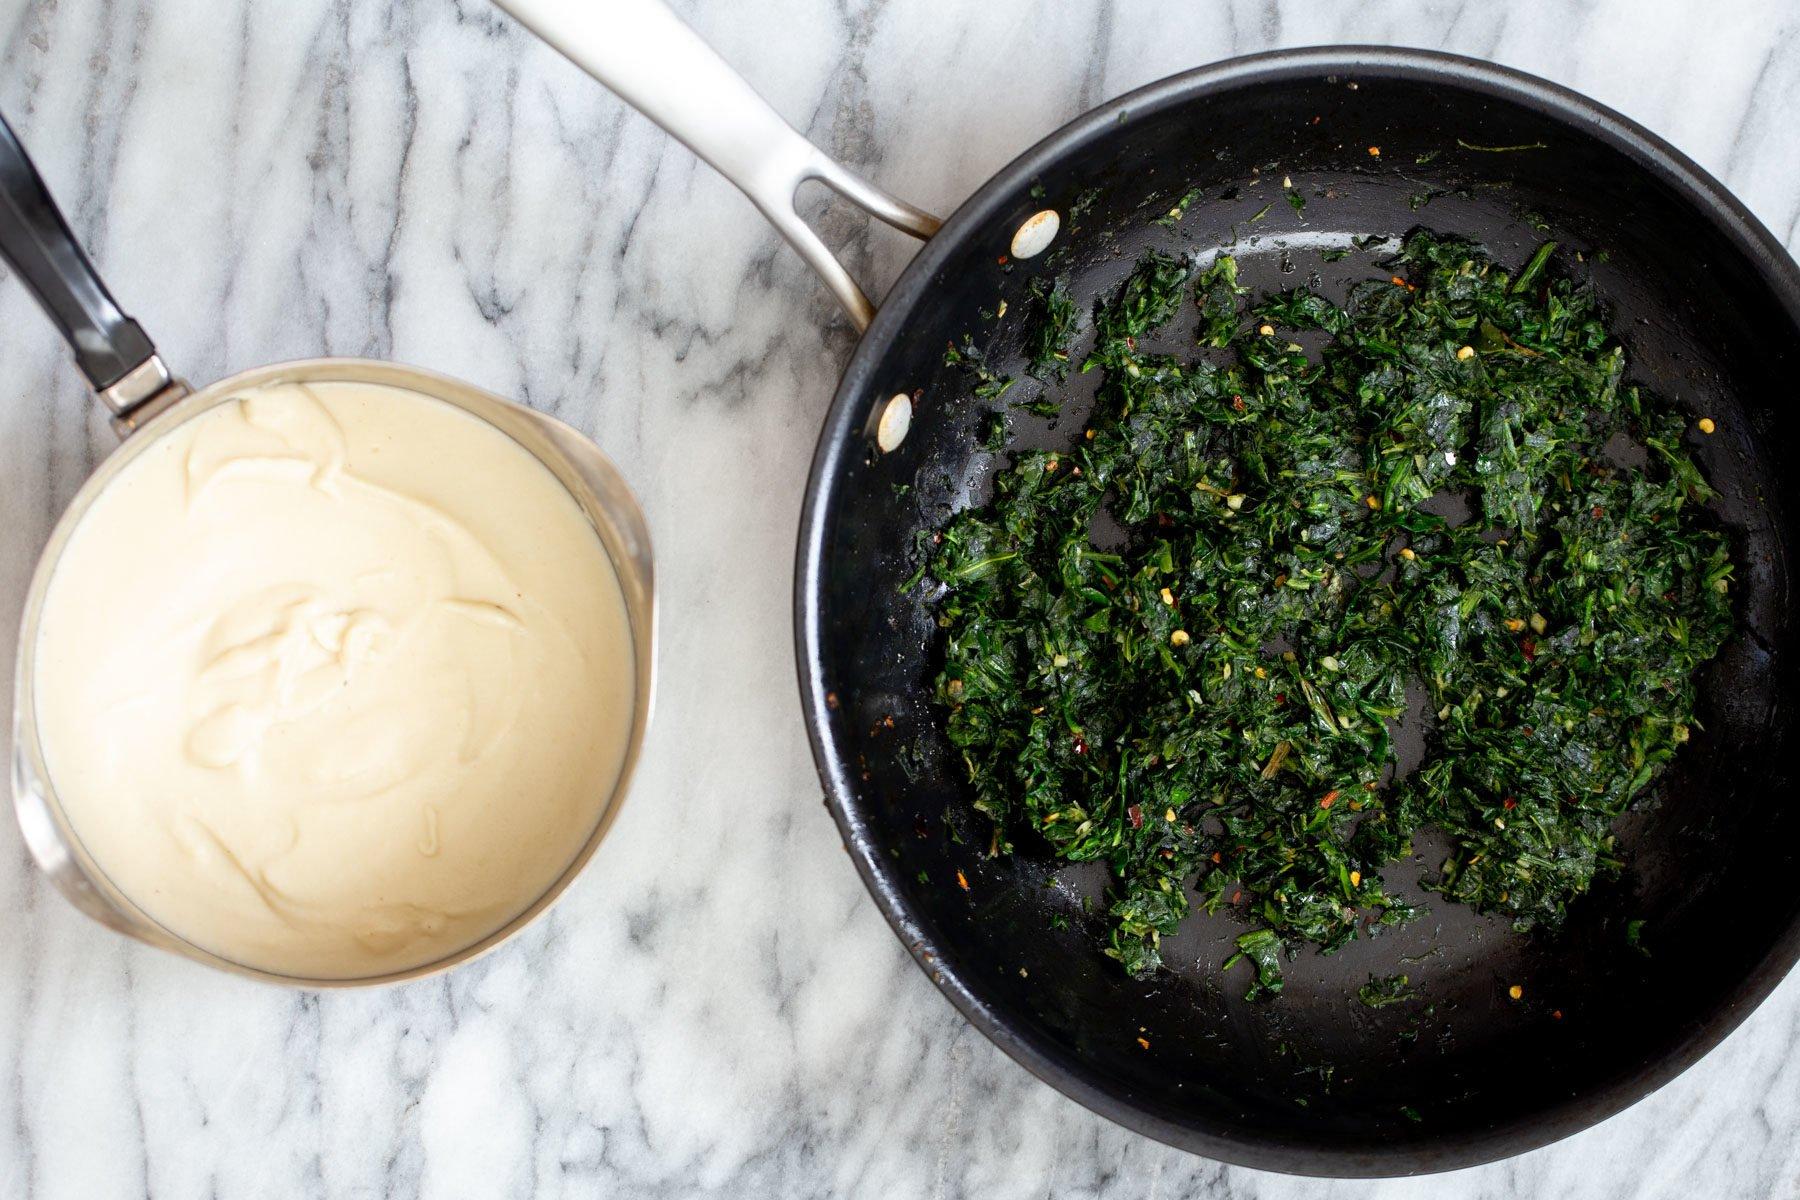 a pan with sauteed spinach next to a saucepan with vegan mozzarella cheese spread